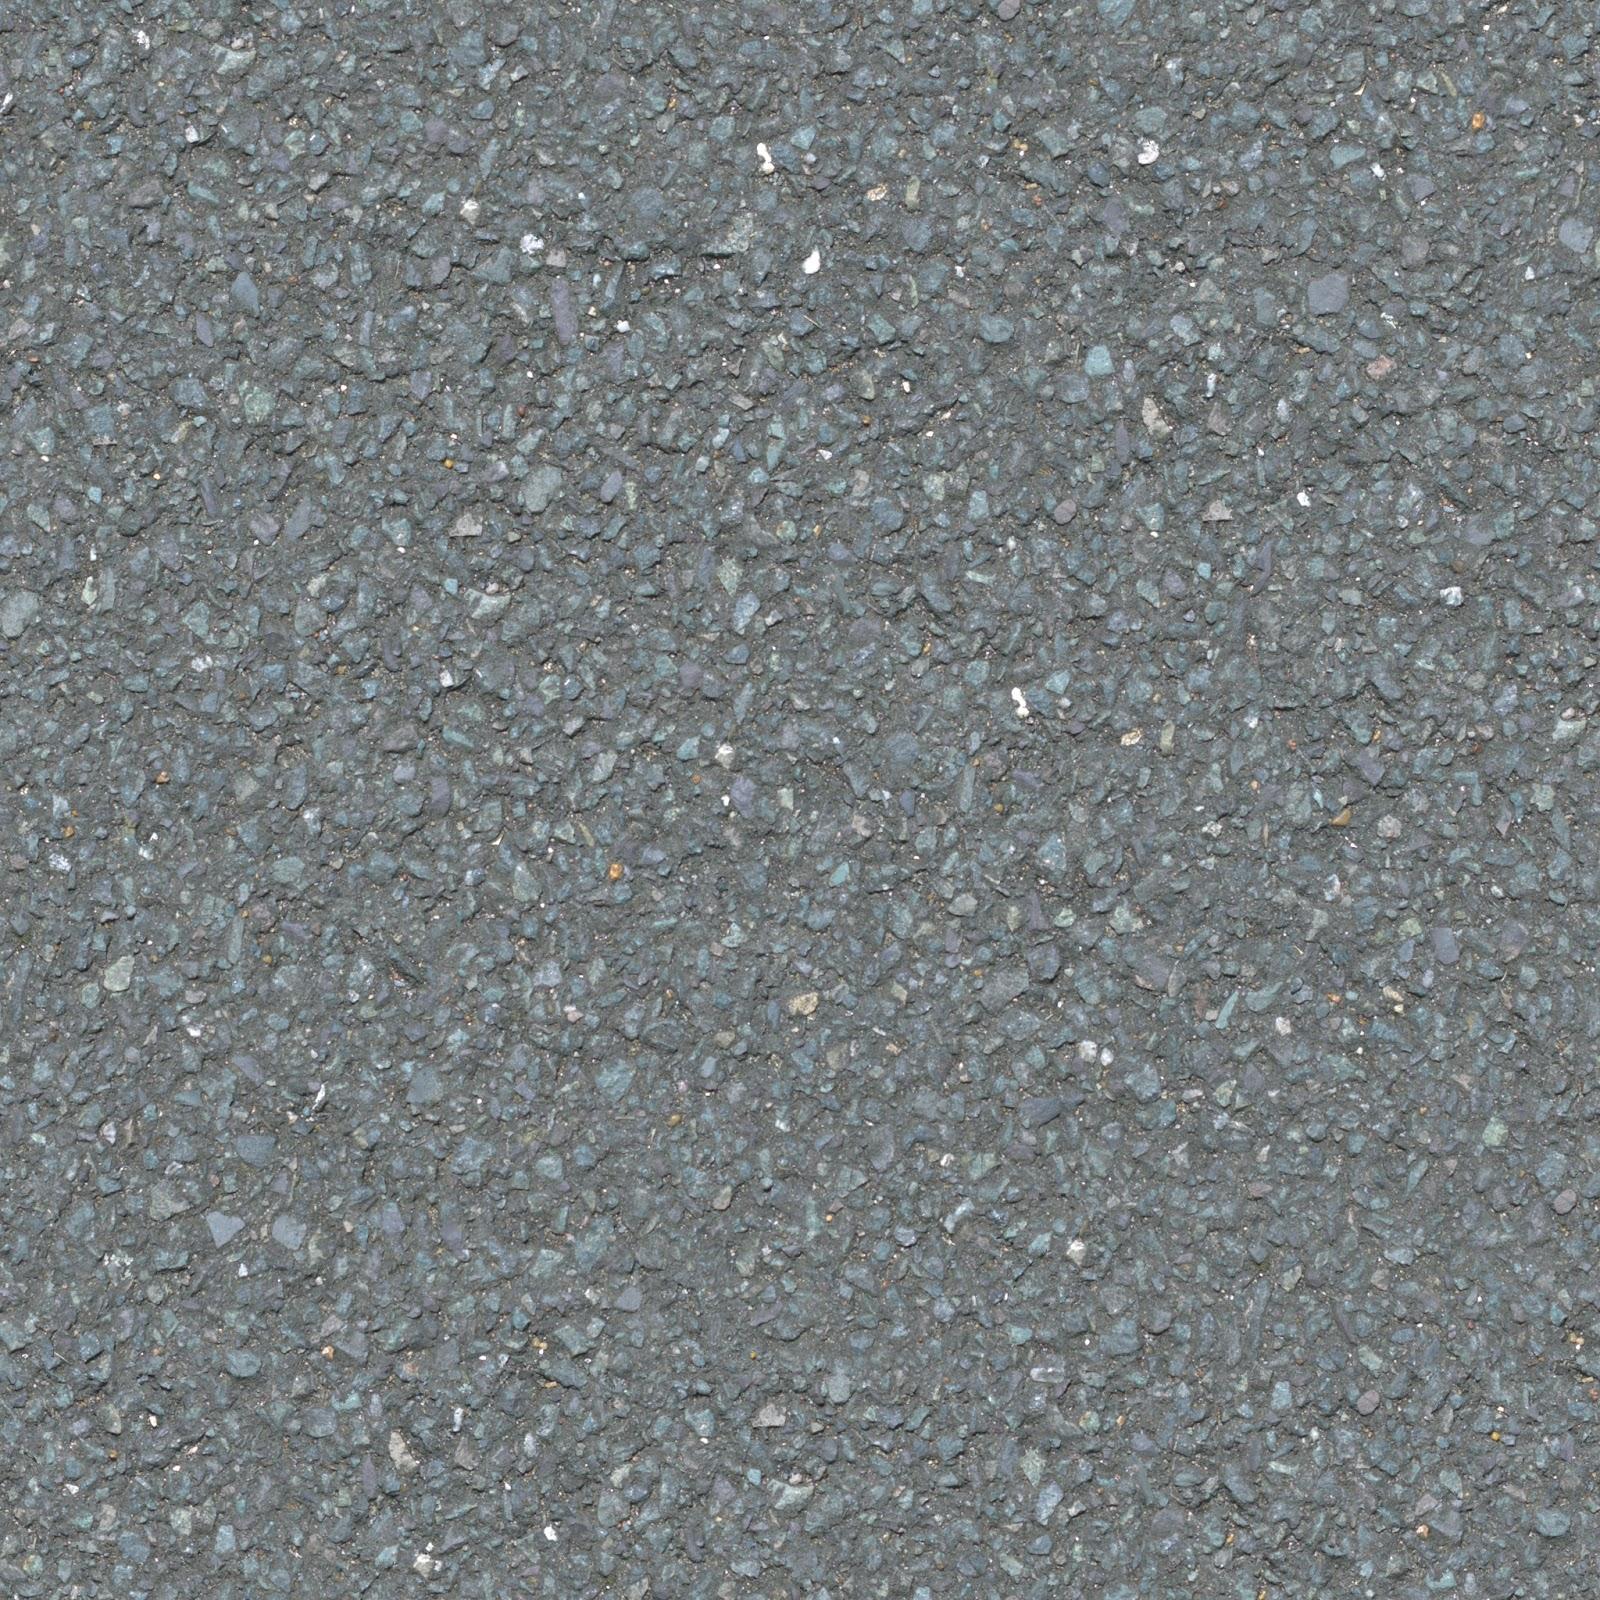 Seamless asphalt tarmac road tar texture ver 2